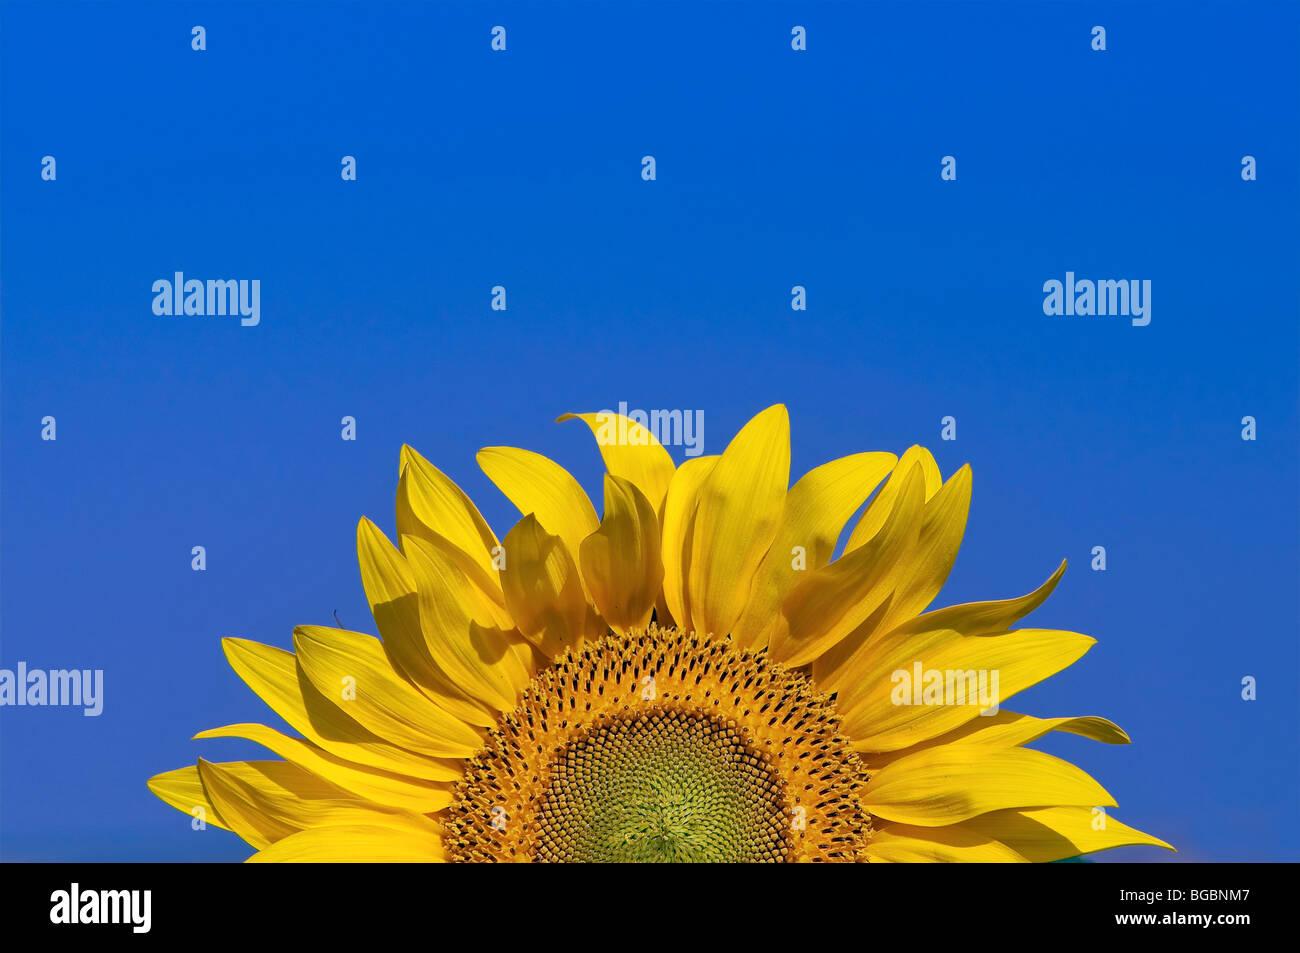 Sun flower and blue sky - Stock Image